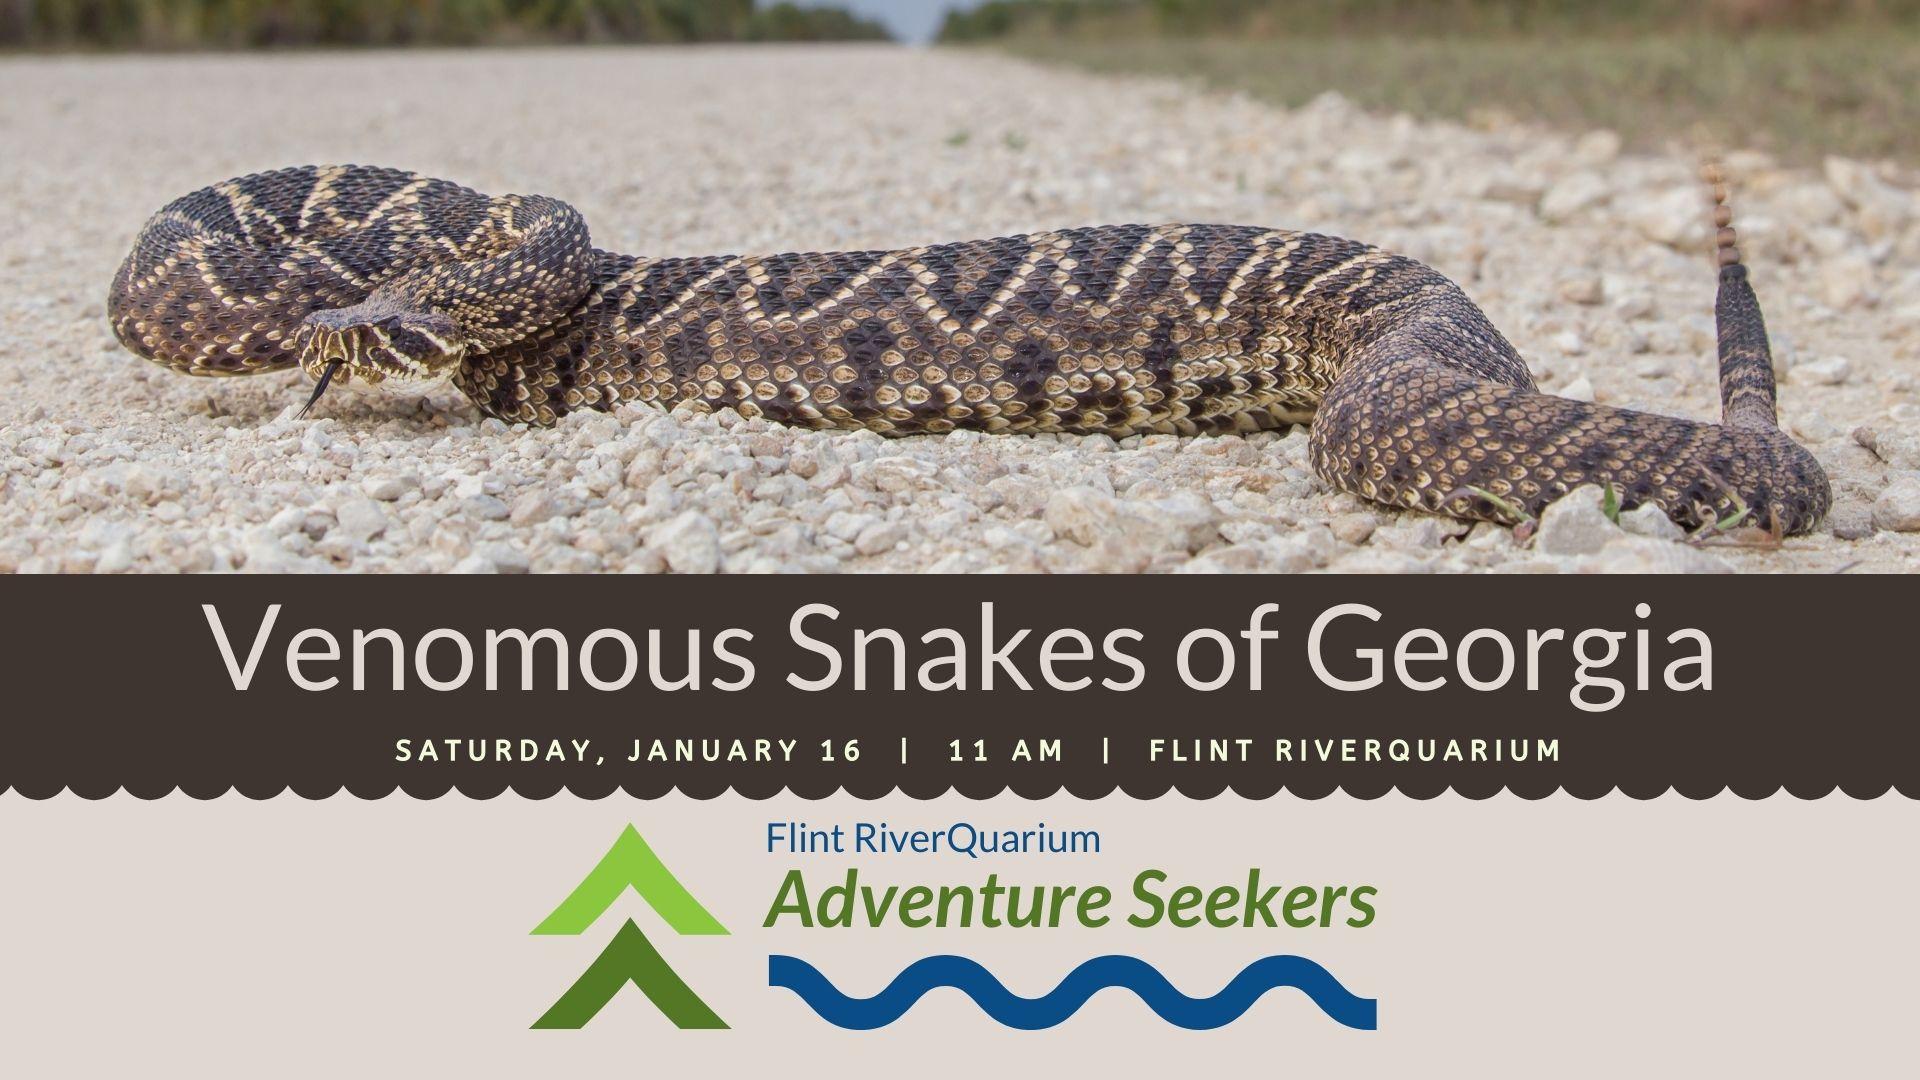 Adventure Seekers: Venomous Snakes of Georgia